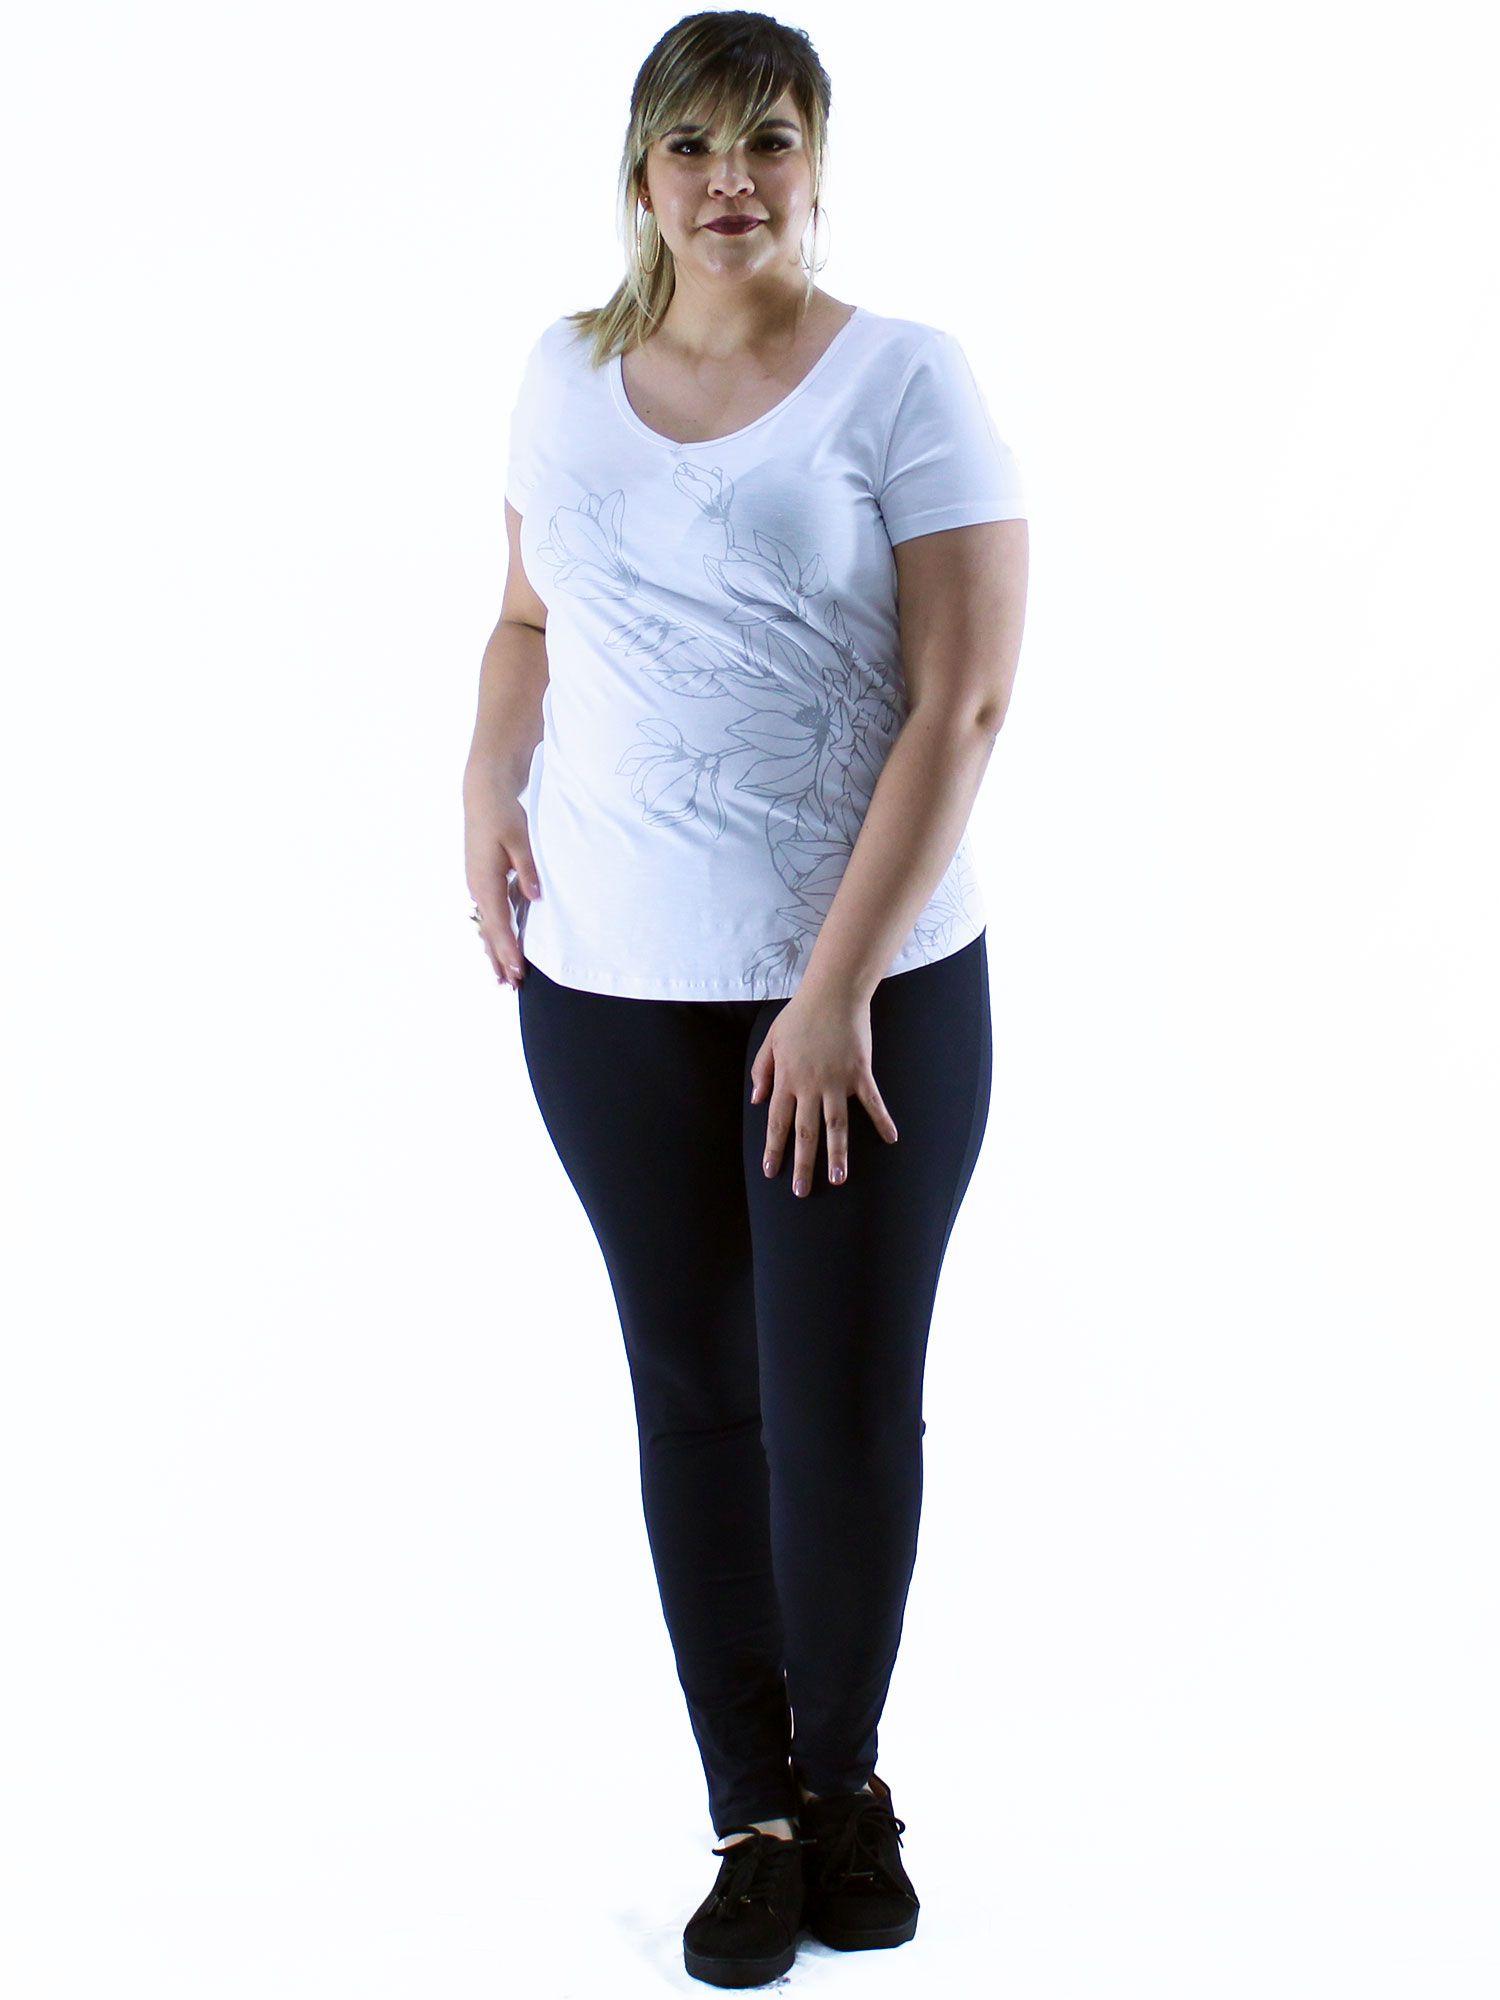 Blusa Plus Size KTS Decote V. com Estampa Branco